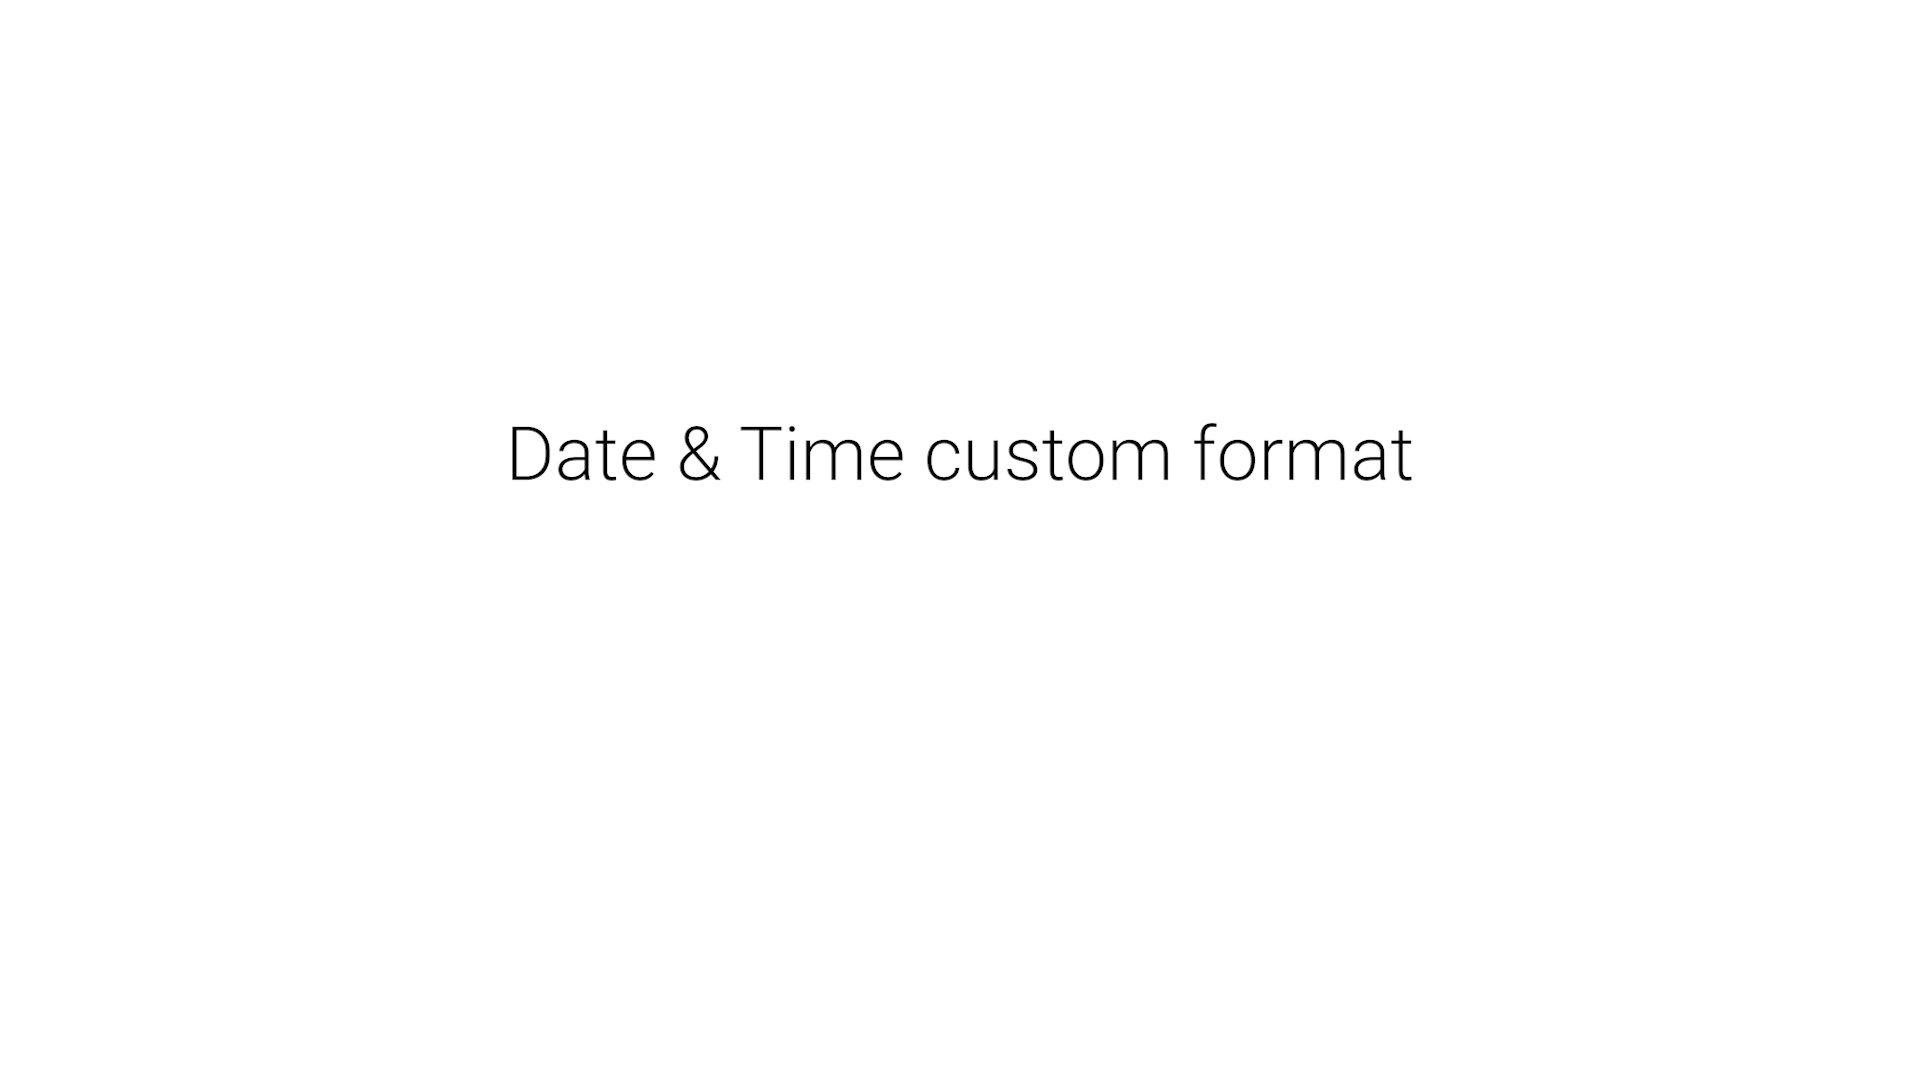 13_Date_&_Time_custom_format